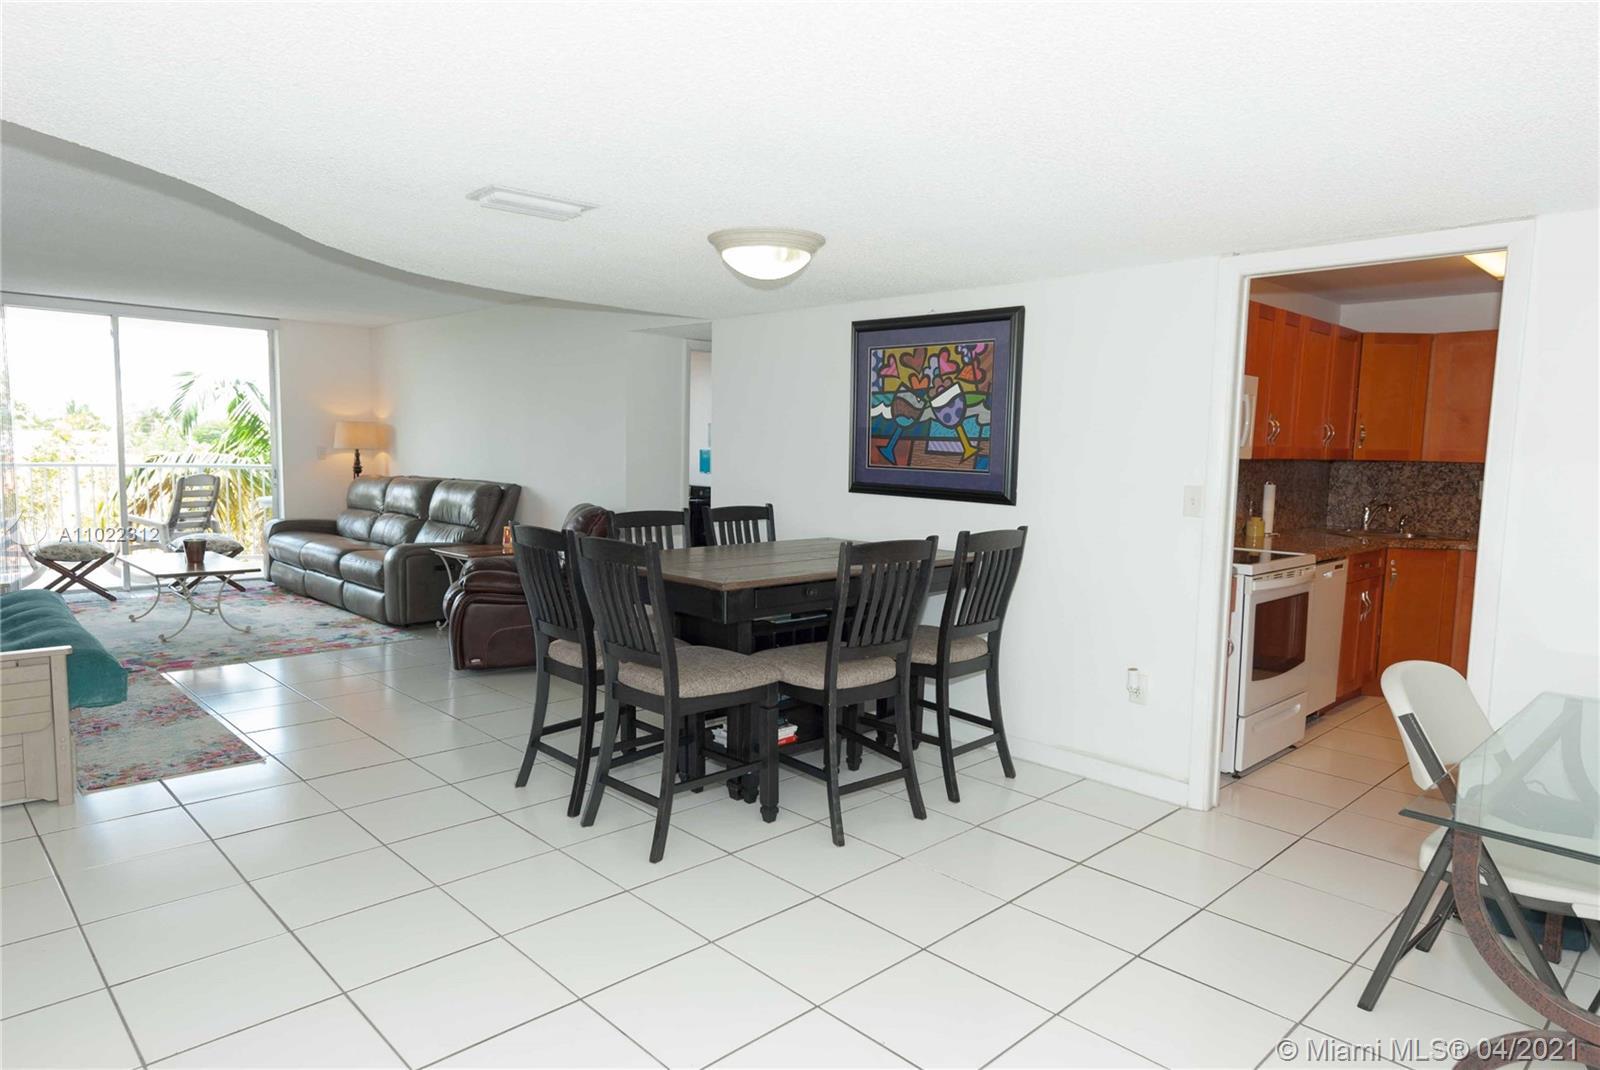 Cape Florida Club #405 - 210 SeaView Dr #405, Key Biscayne, FL 33149